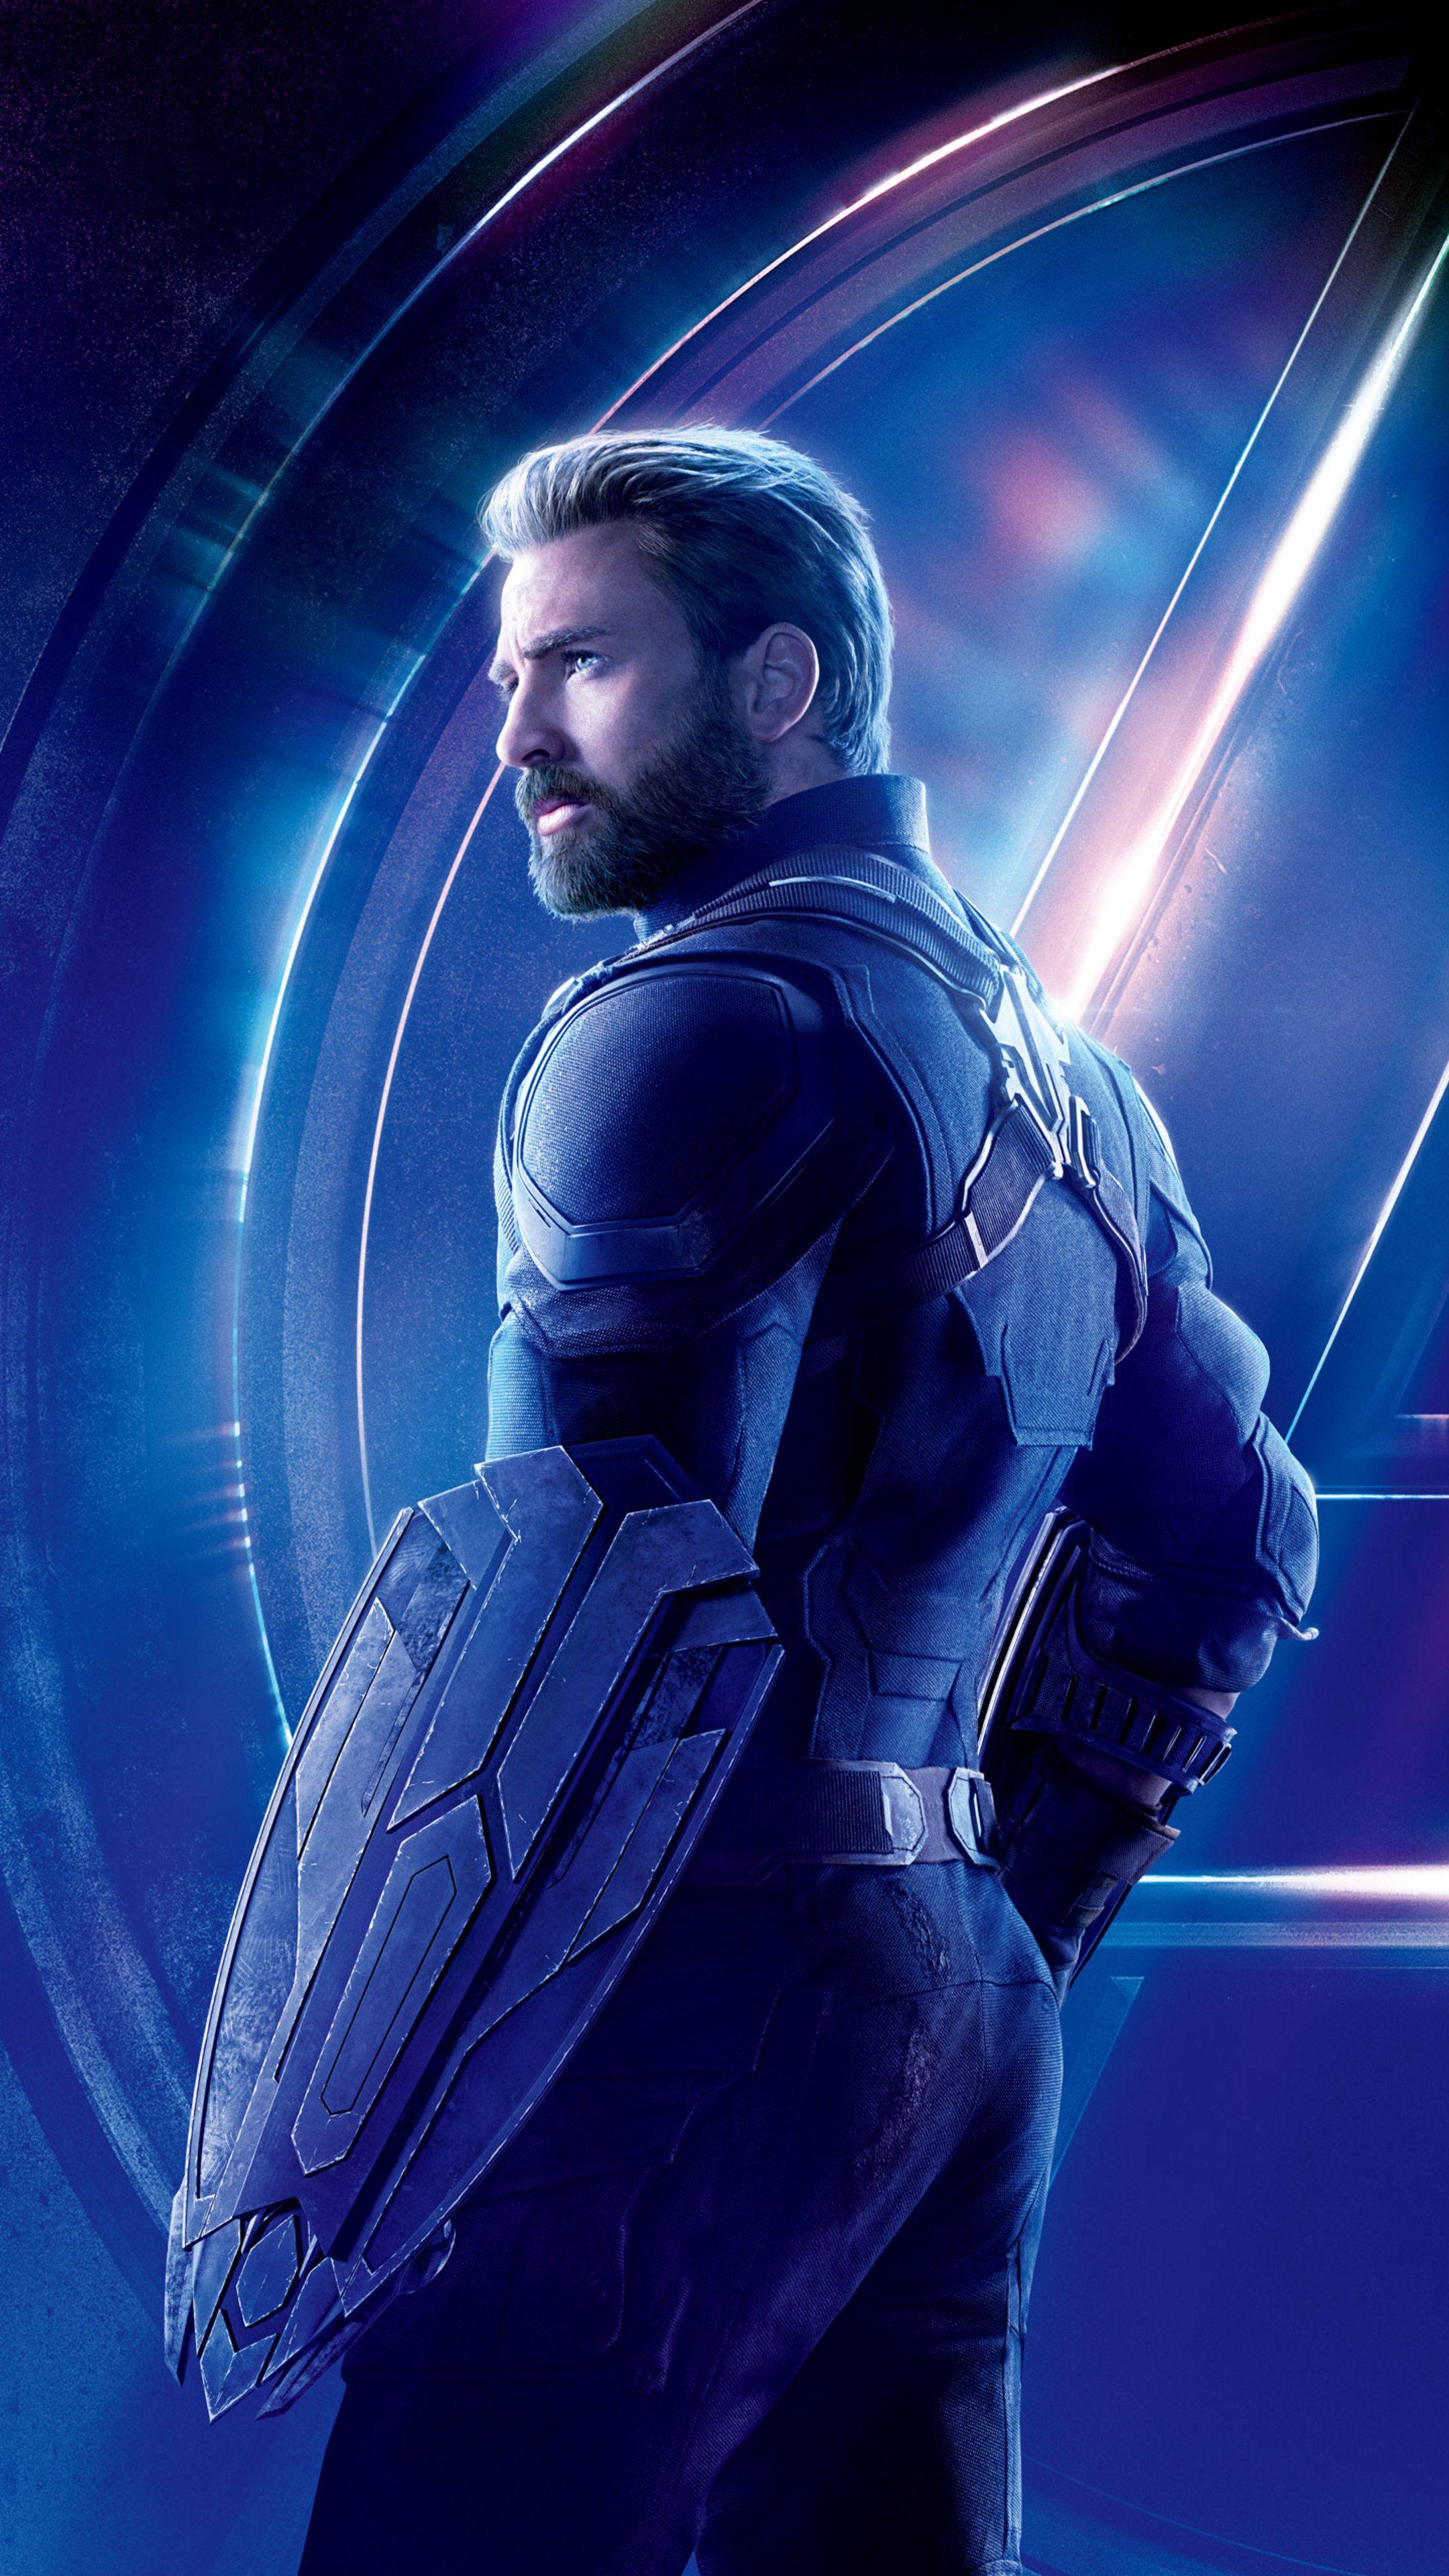 Captain America In Avengers Infinity War 8k Poster 7h 2160x3840 Jpg 2160 3840 Captain America Poster Avengers Poster Avengers Infinity War